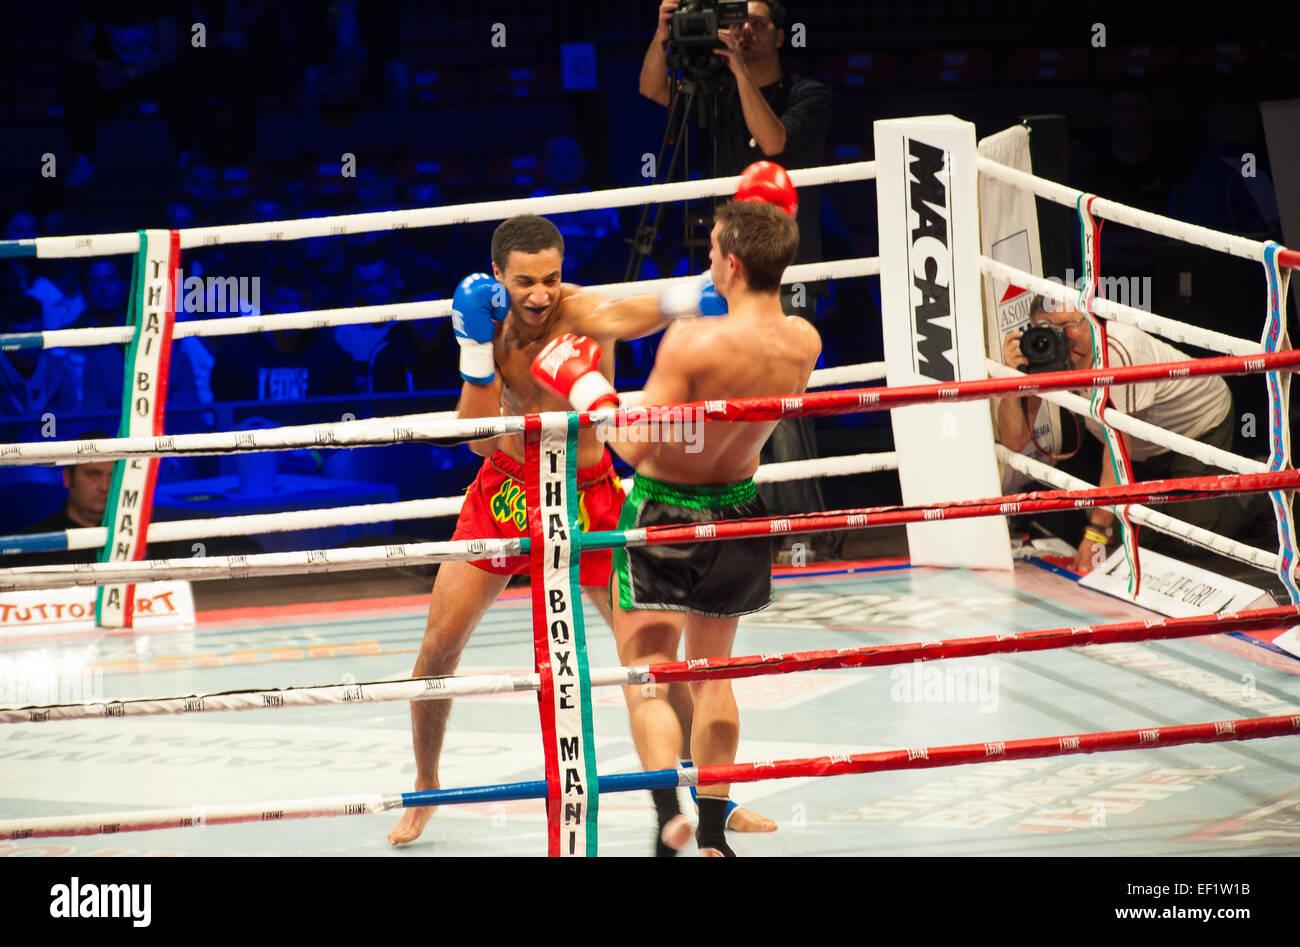 Torino, Italy. 24th January, 2015. Thai Box Mania - Prestige Pre Card -Match Bruno Belforge France Vs Sam El Bahjaoui. - Stock Image